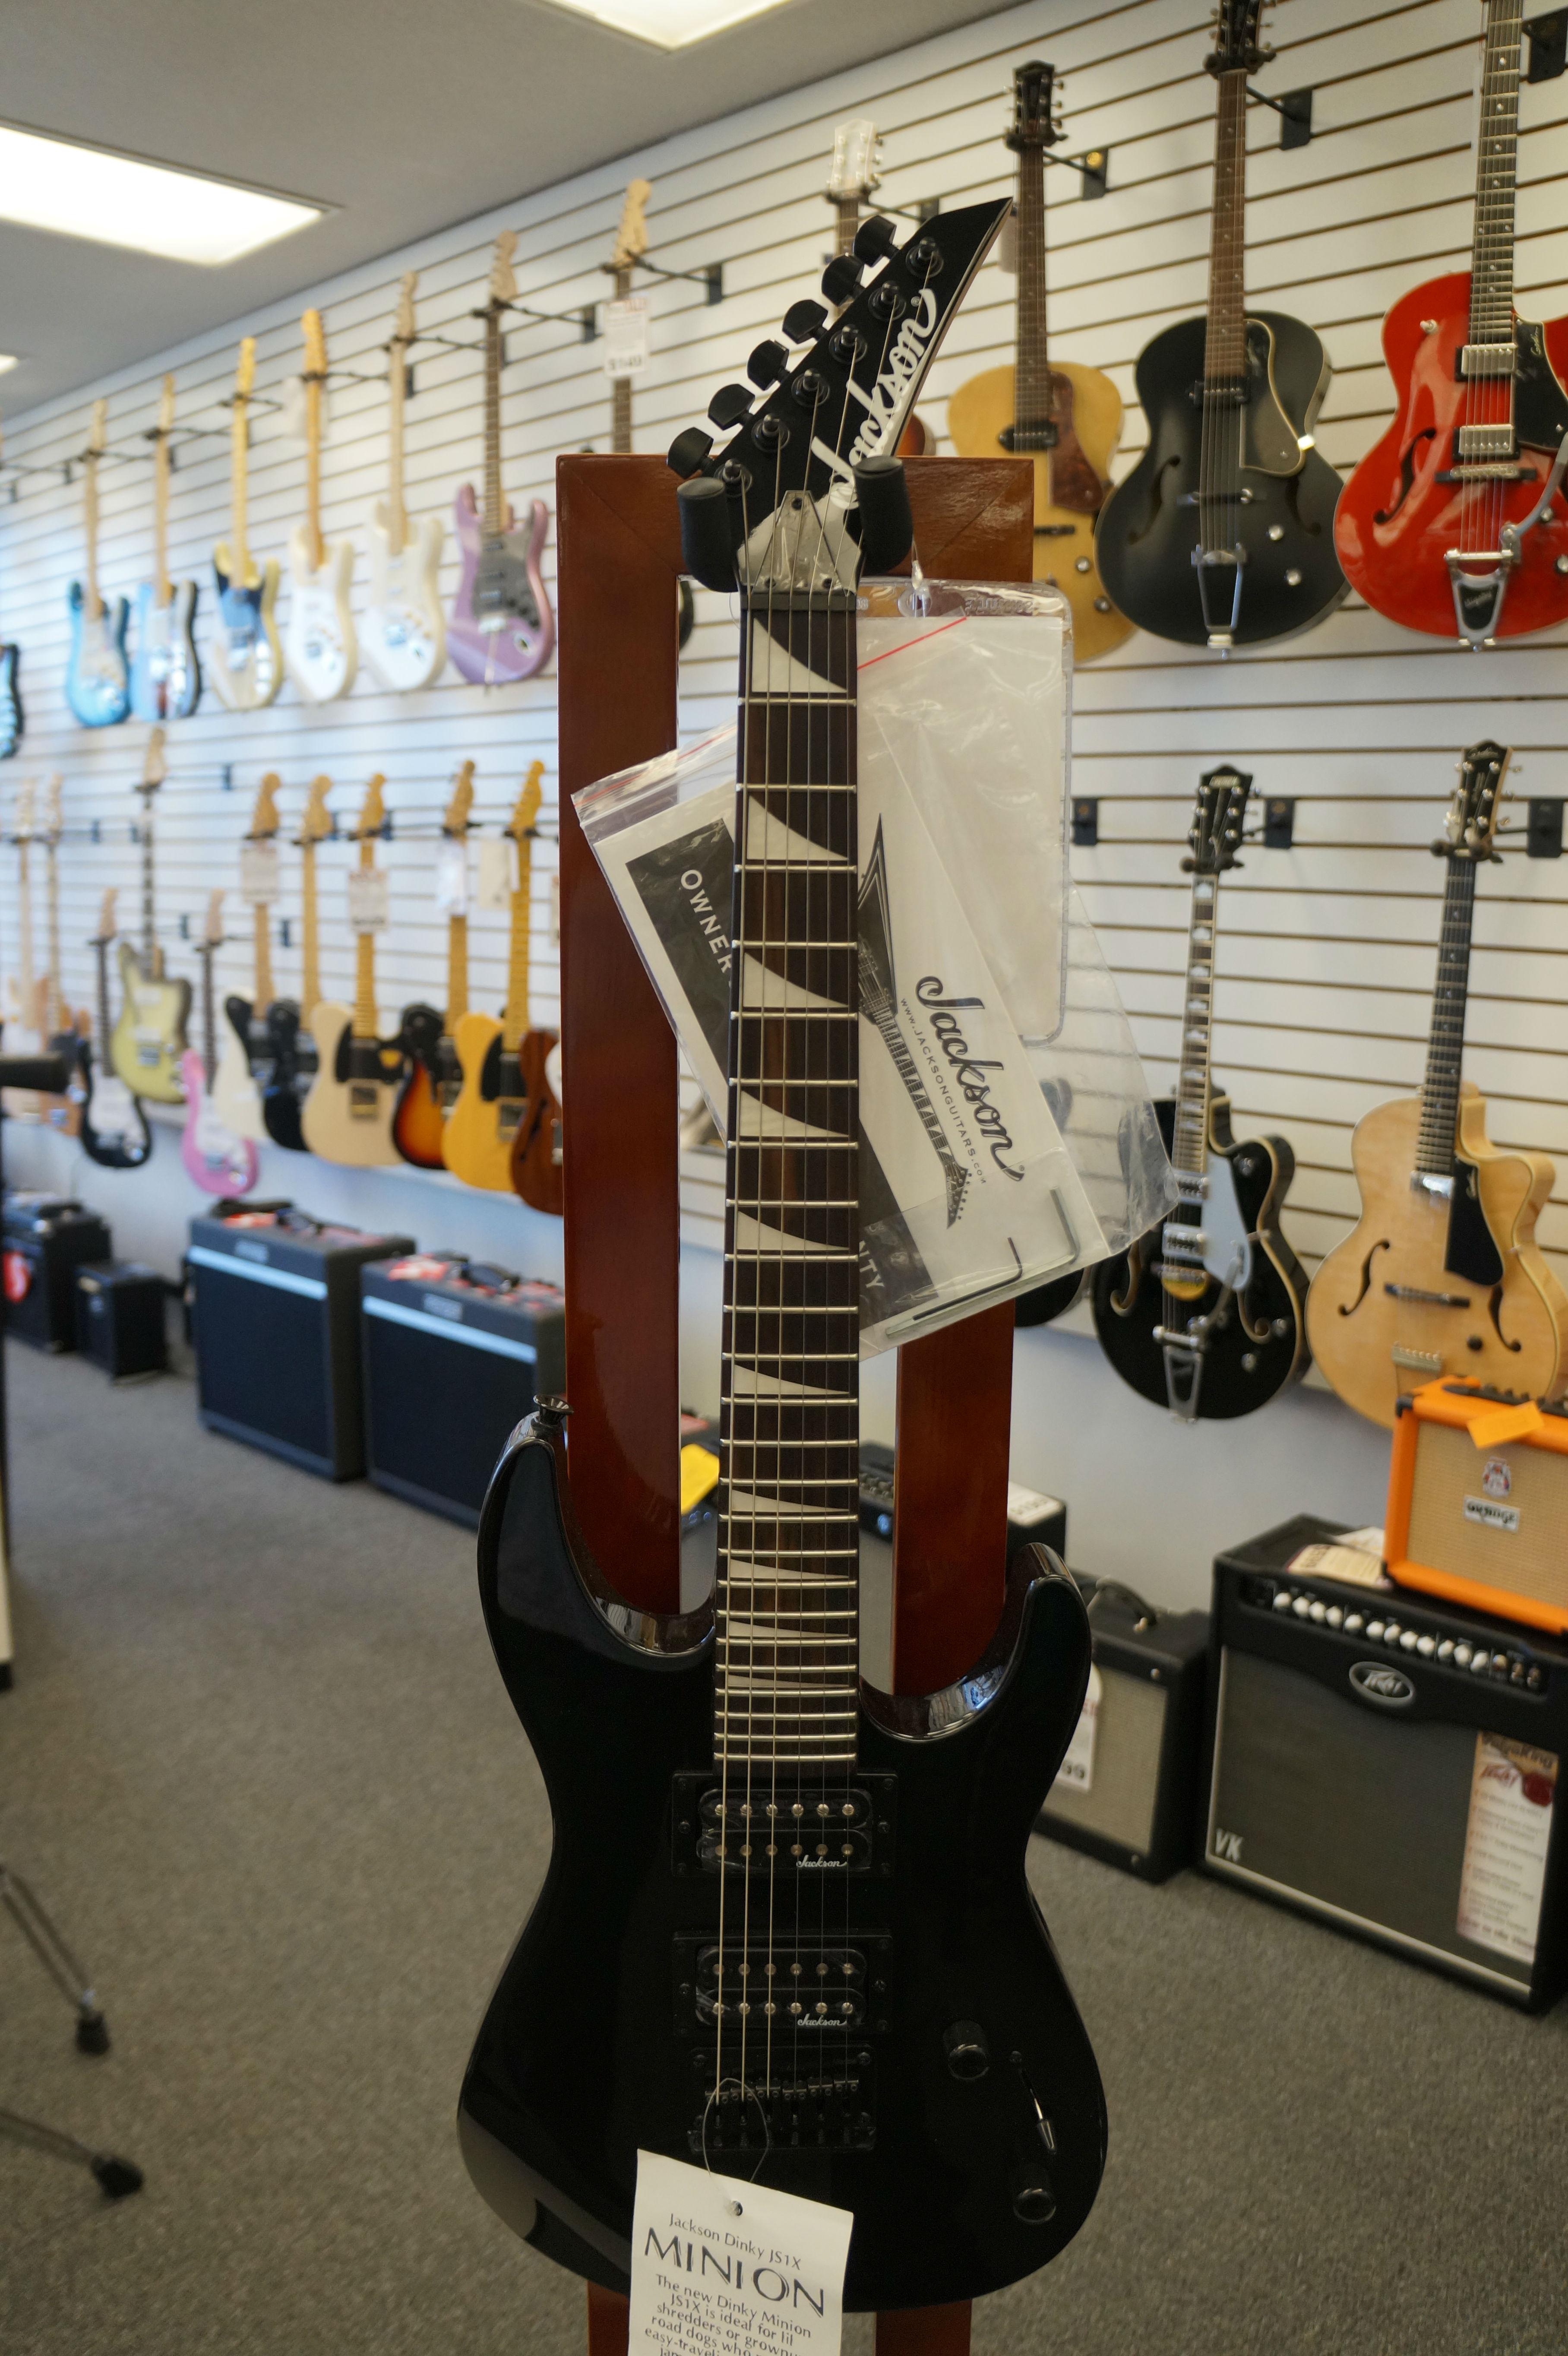 jackson js series dinky minion js1x electric guitar jim laabs music store. Black Bedroom Furniture Sets. Home Design Ideas